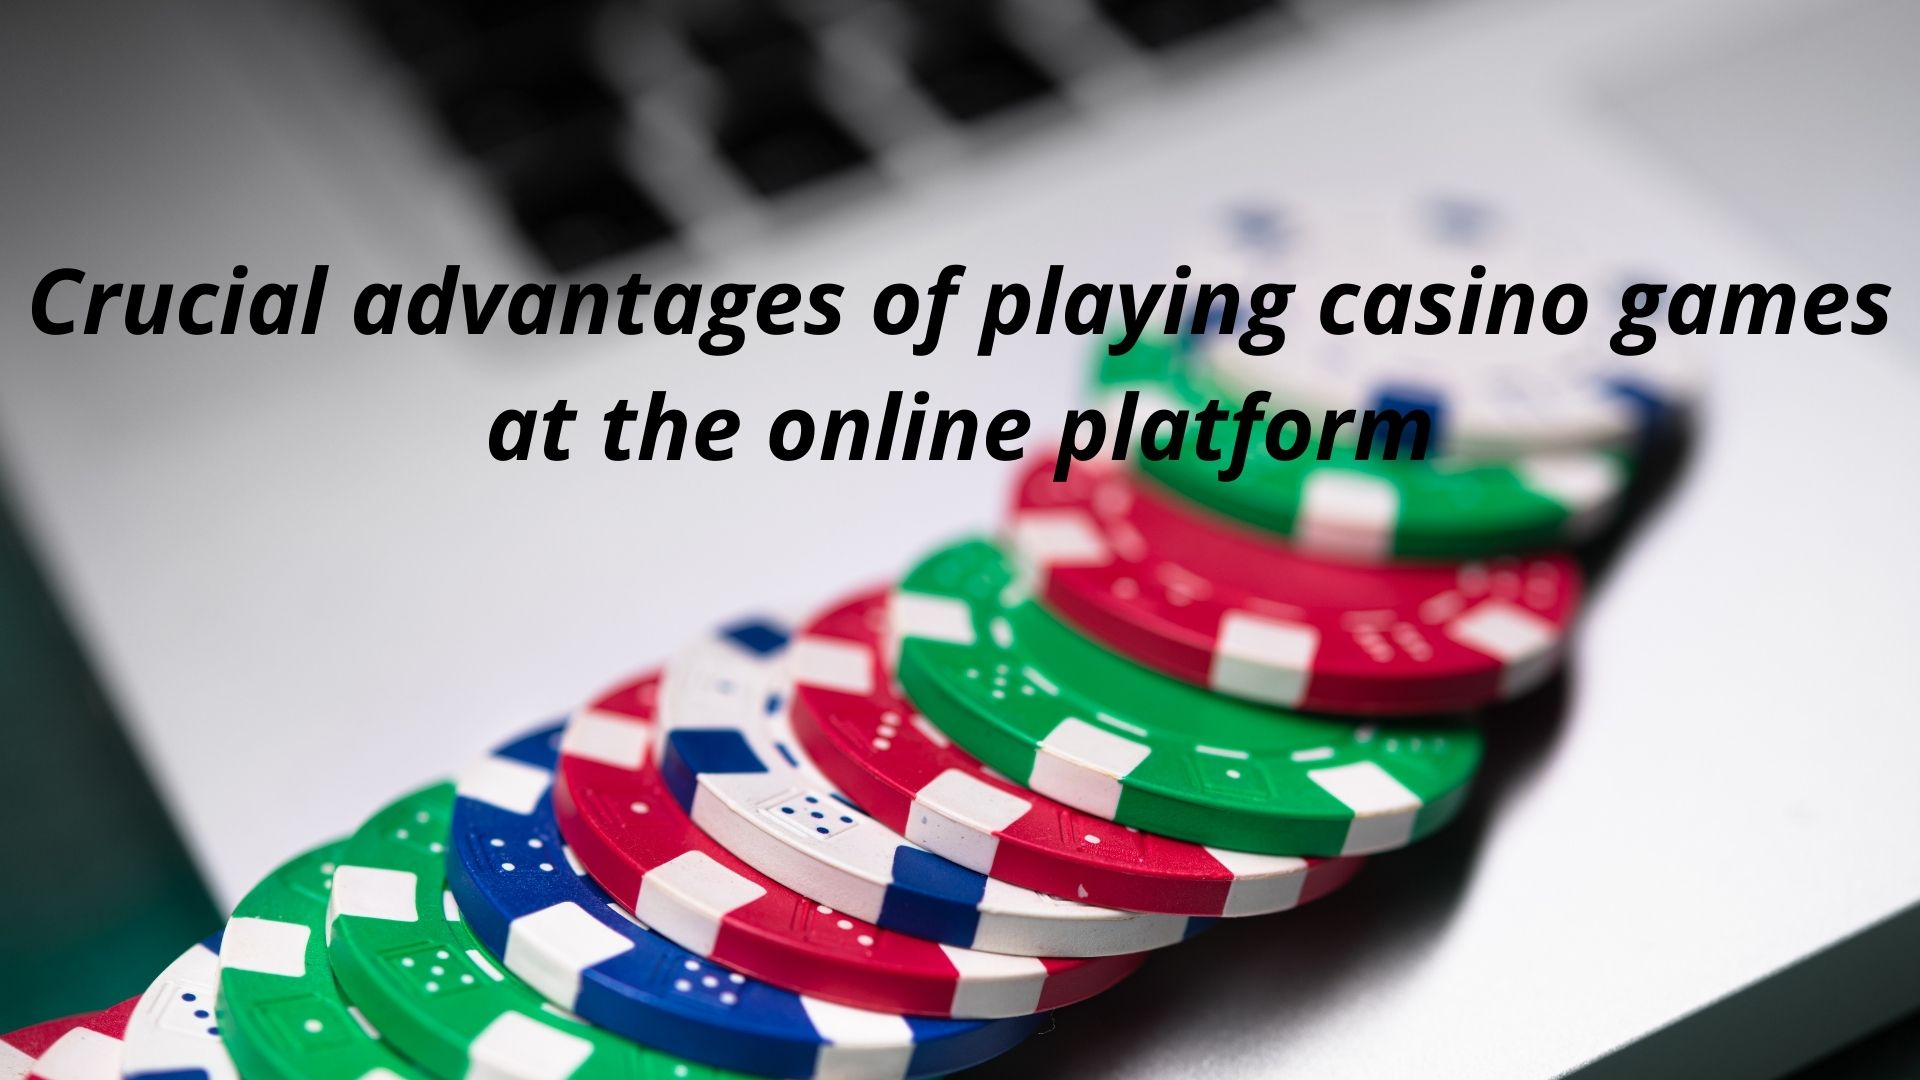 casino games at the online platform